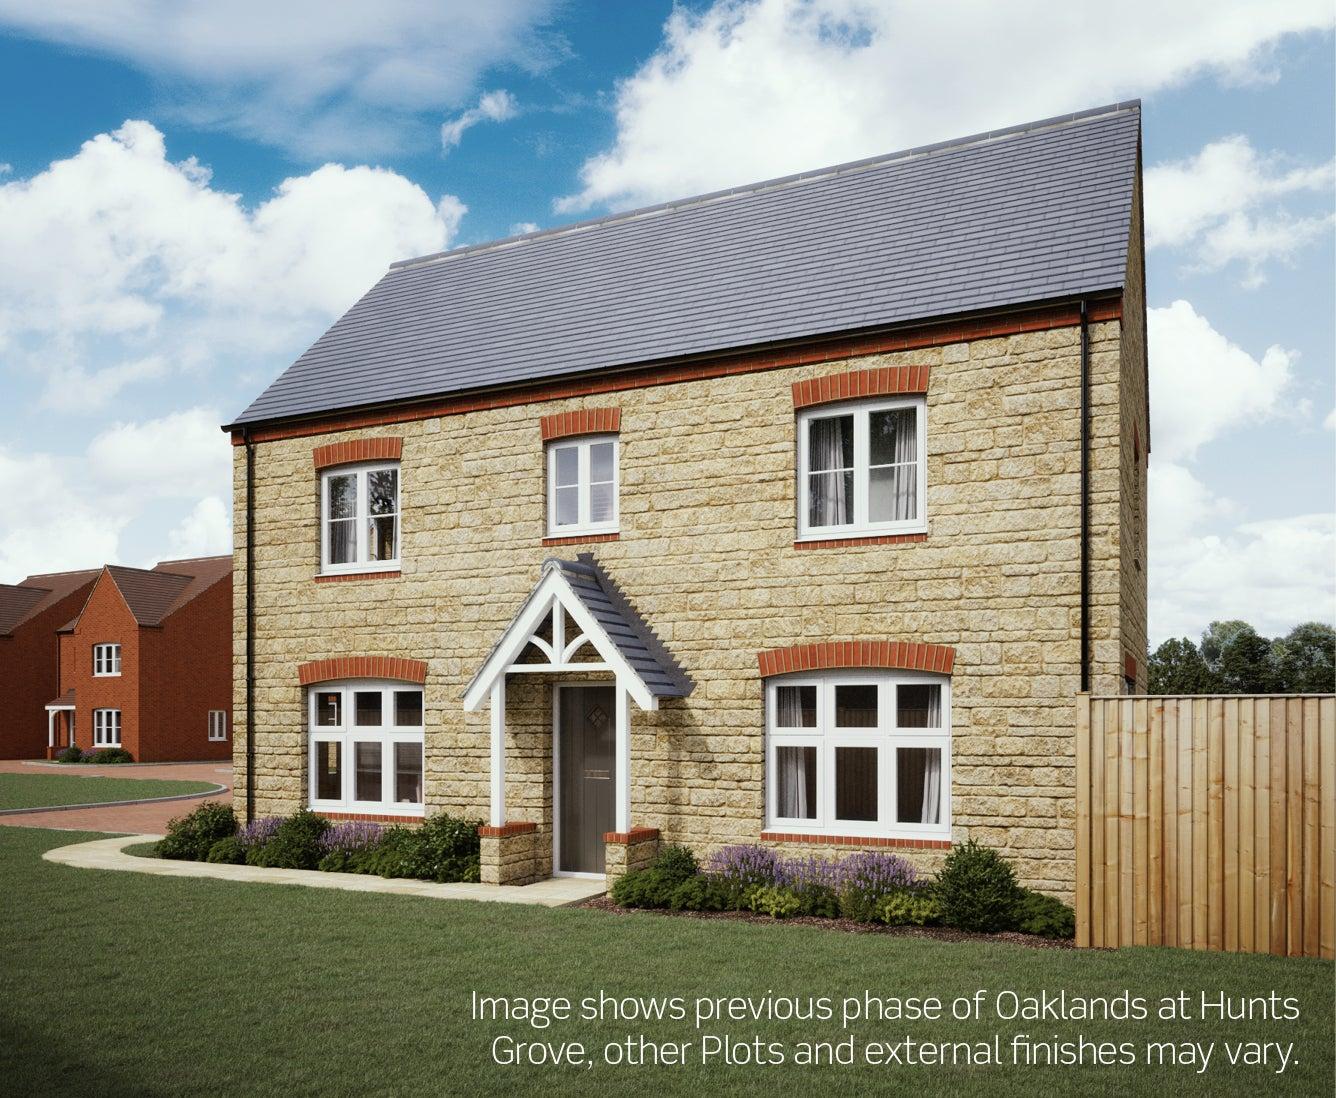 Exterior CGI of the Quedgley house type